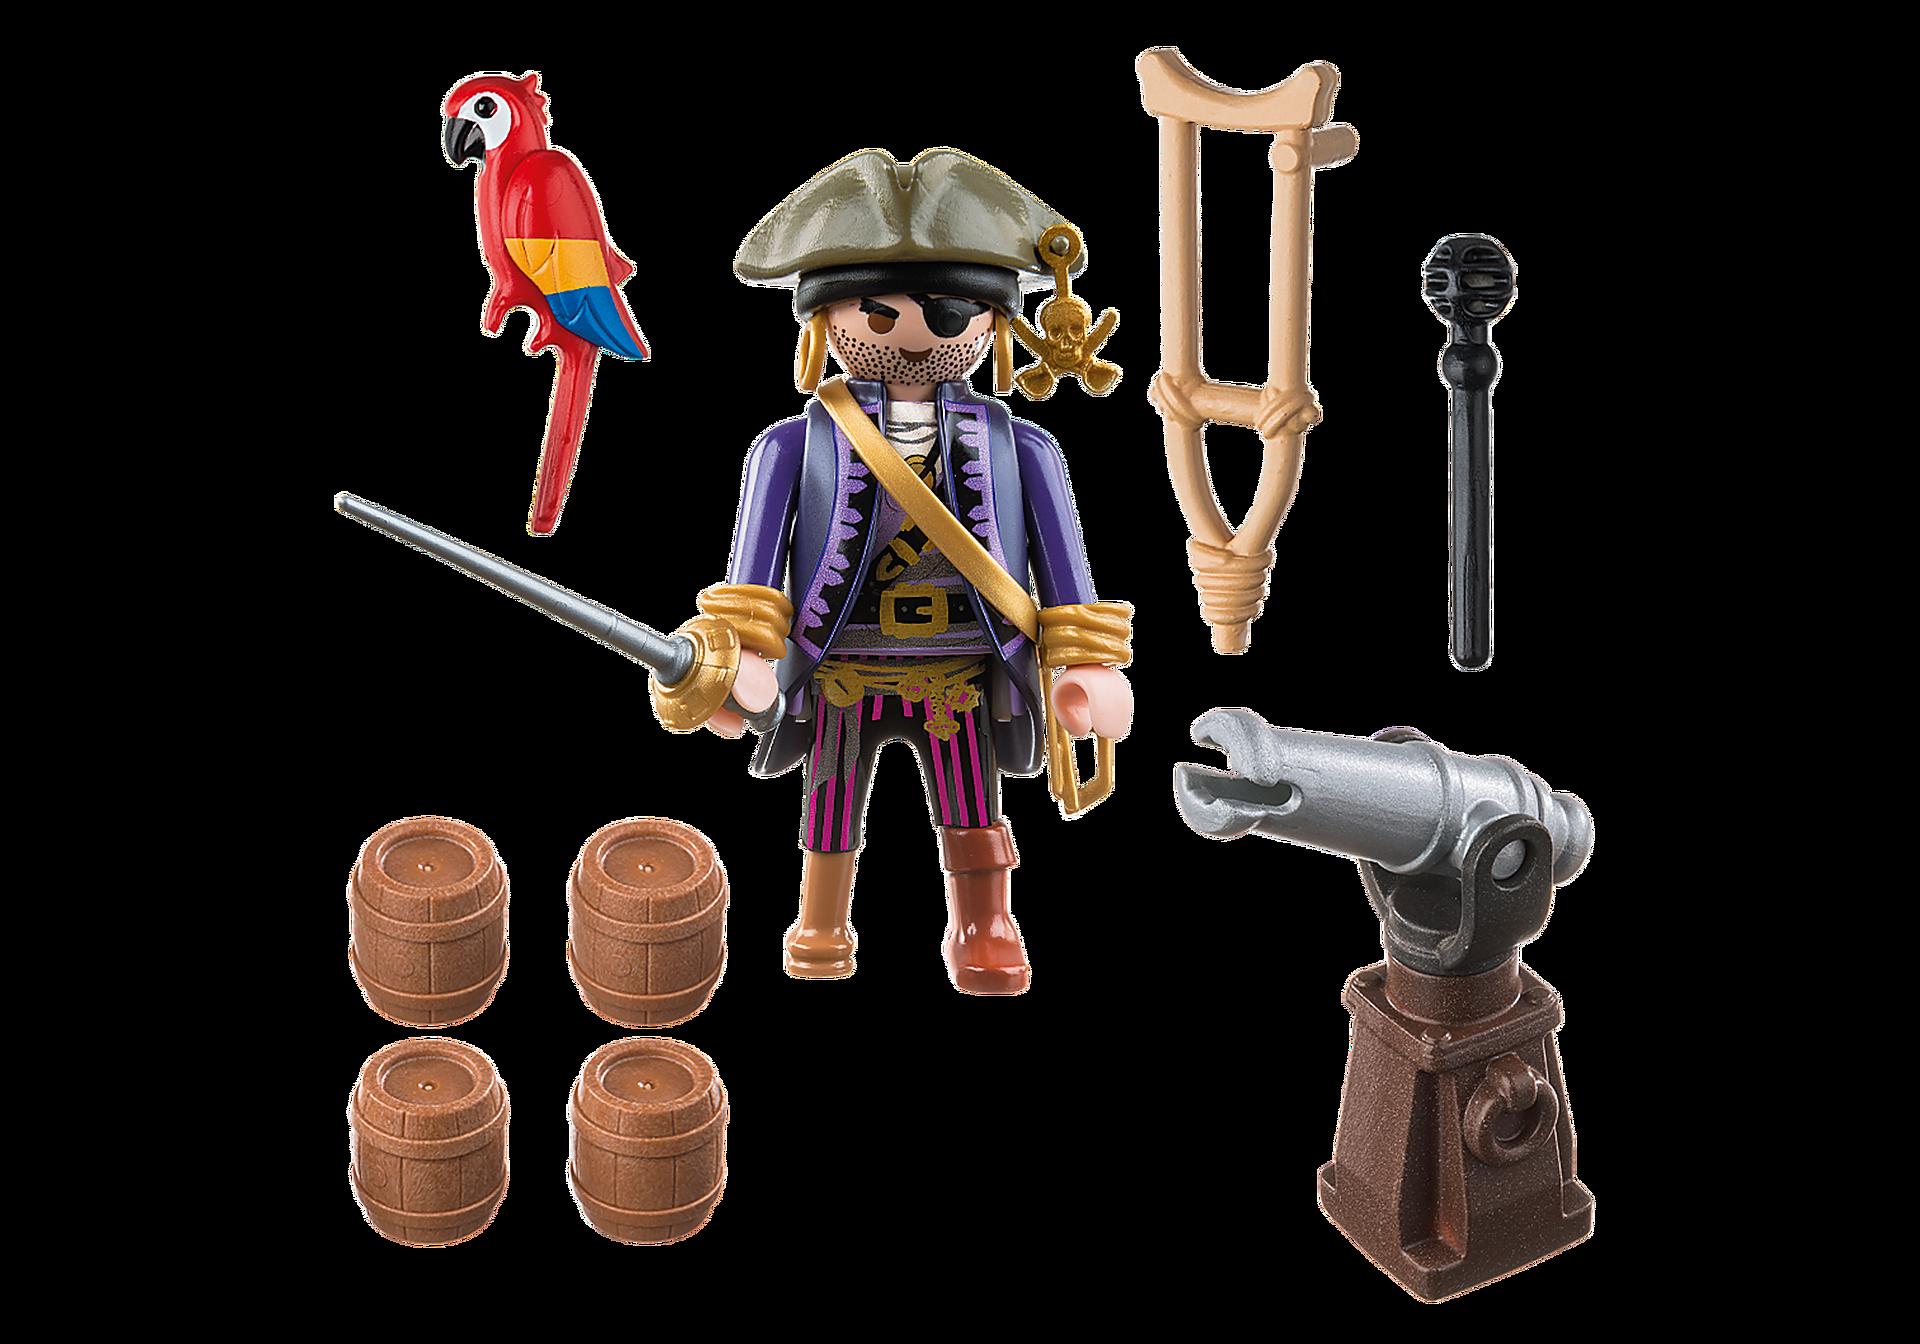 6684 Capitaine pirate avec canon  zoom image3